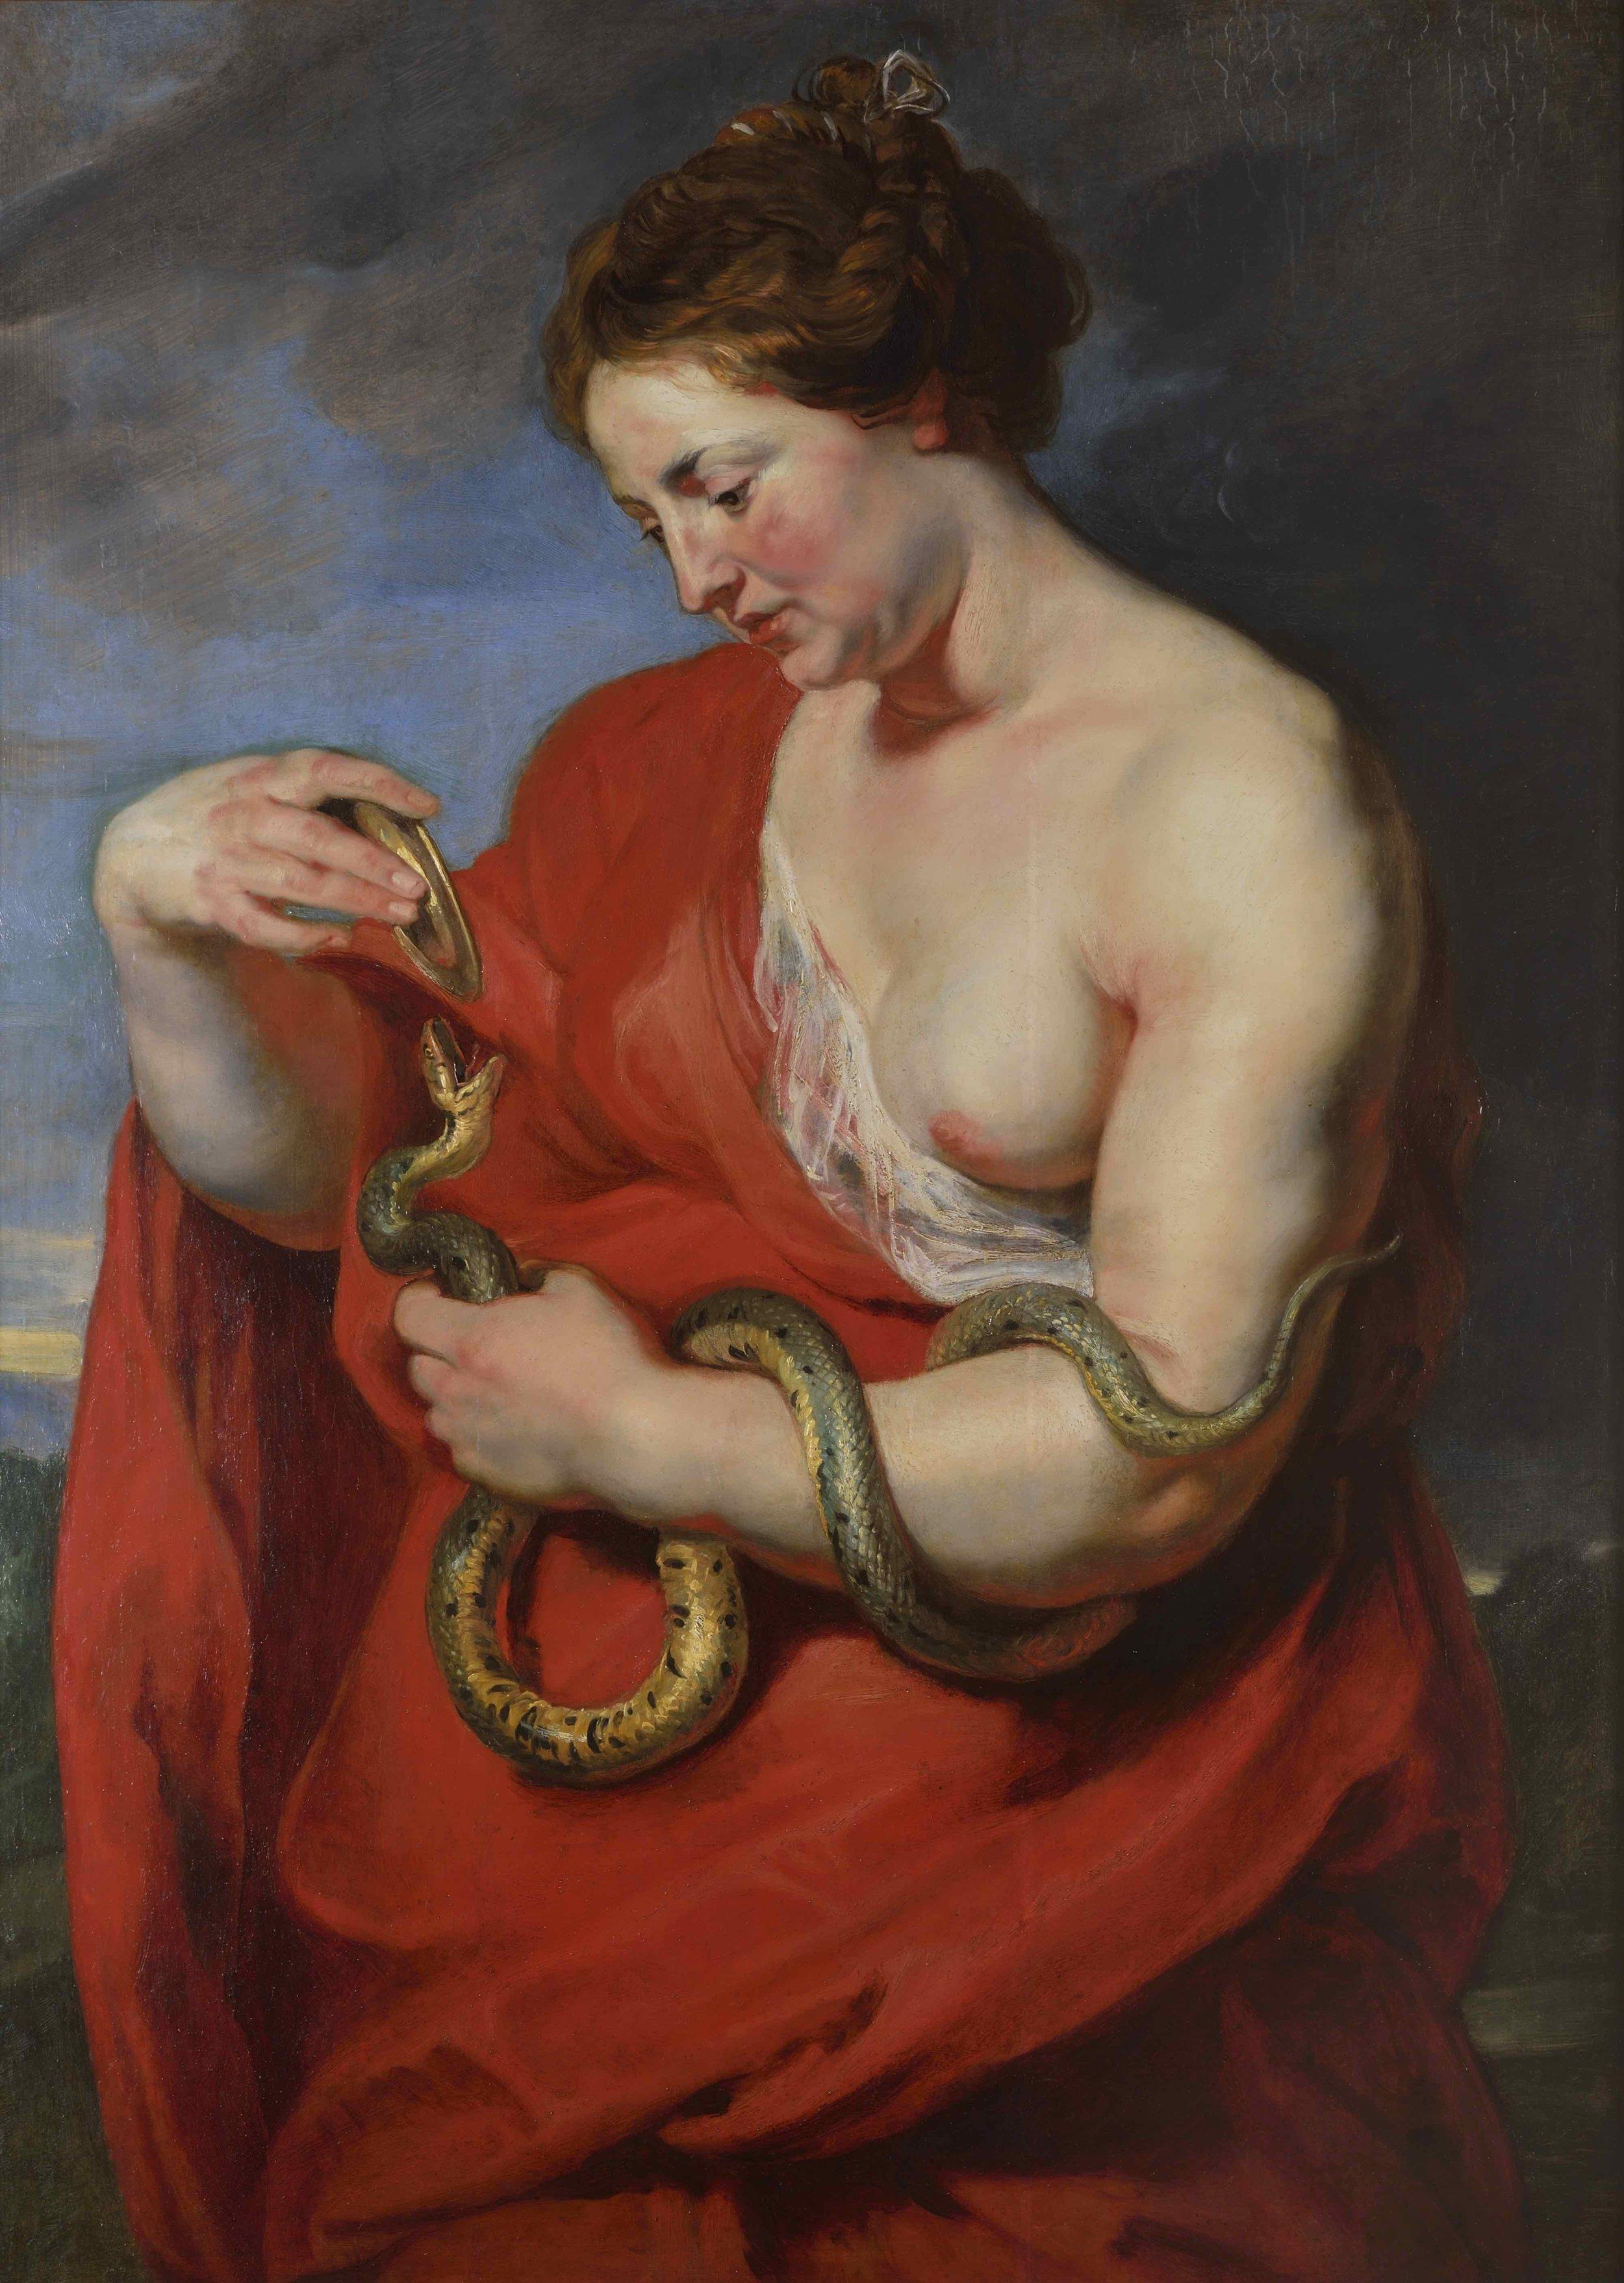 Hygieia Nourishing the Sacred Serpent, Peter Paul Rubens, c. 1614